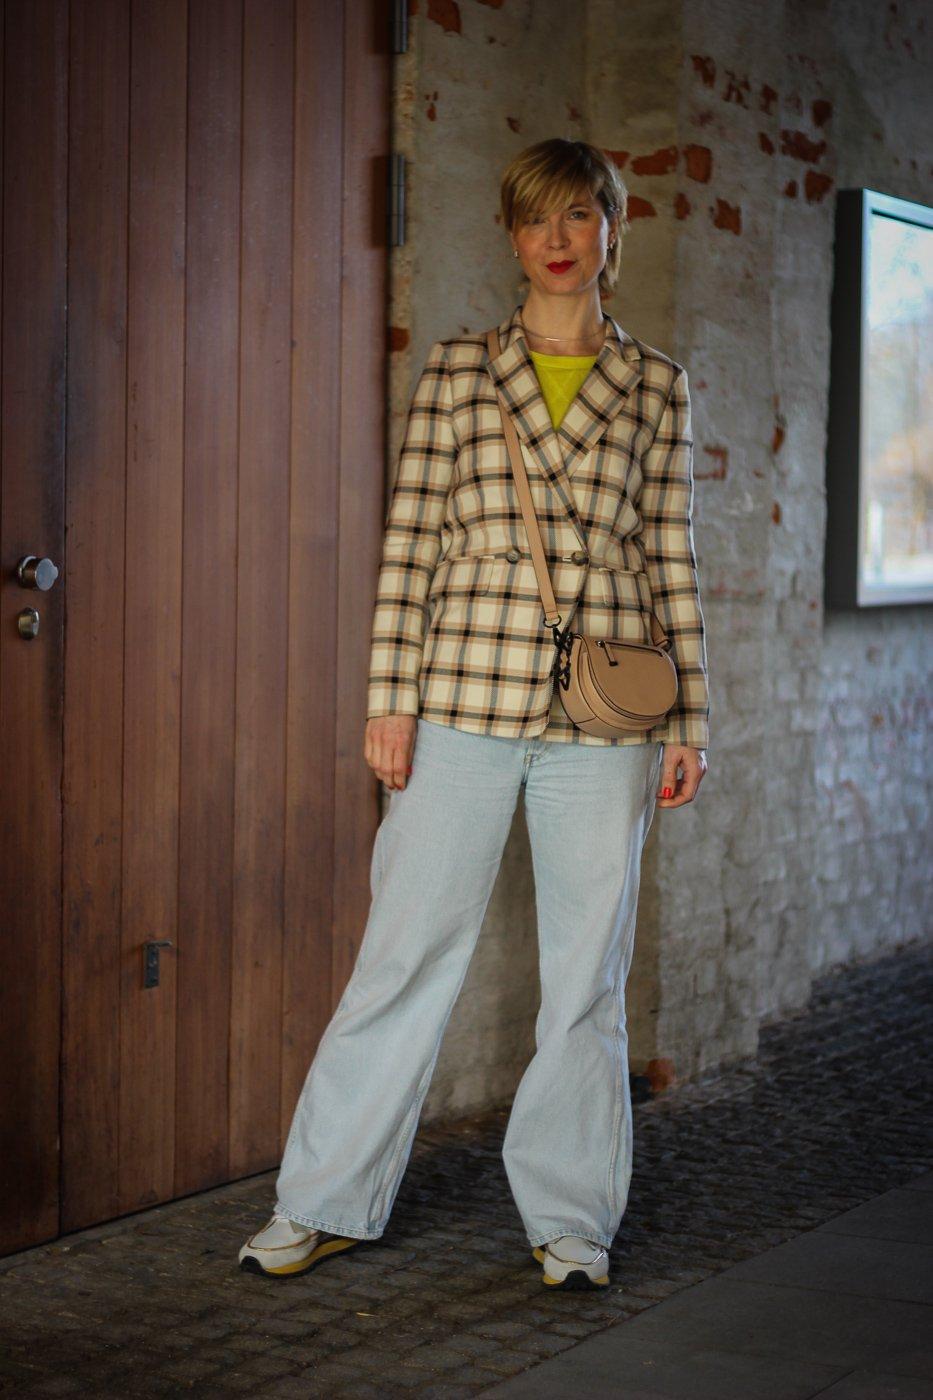 conny doll lifestyle: Frühlingslook, gelber Pullover, Businesscasual, Gleichberechtigung, Karoblazer